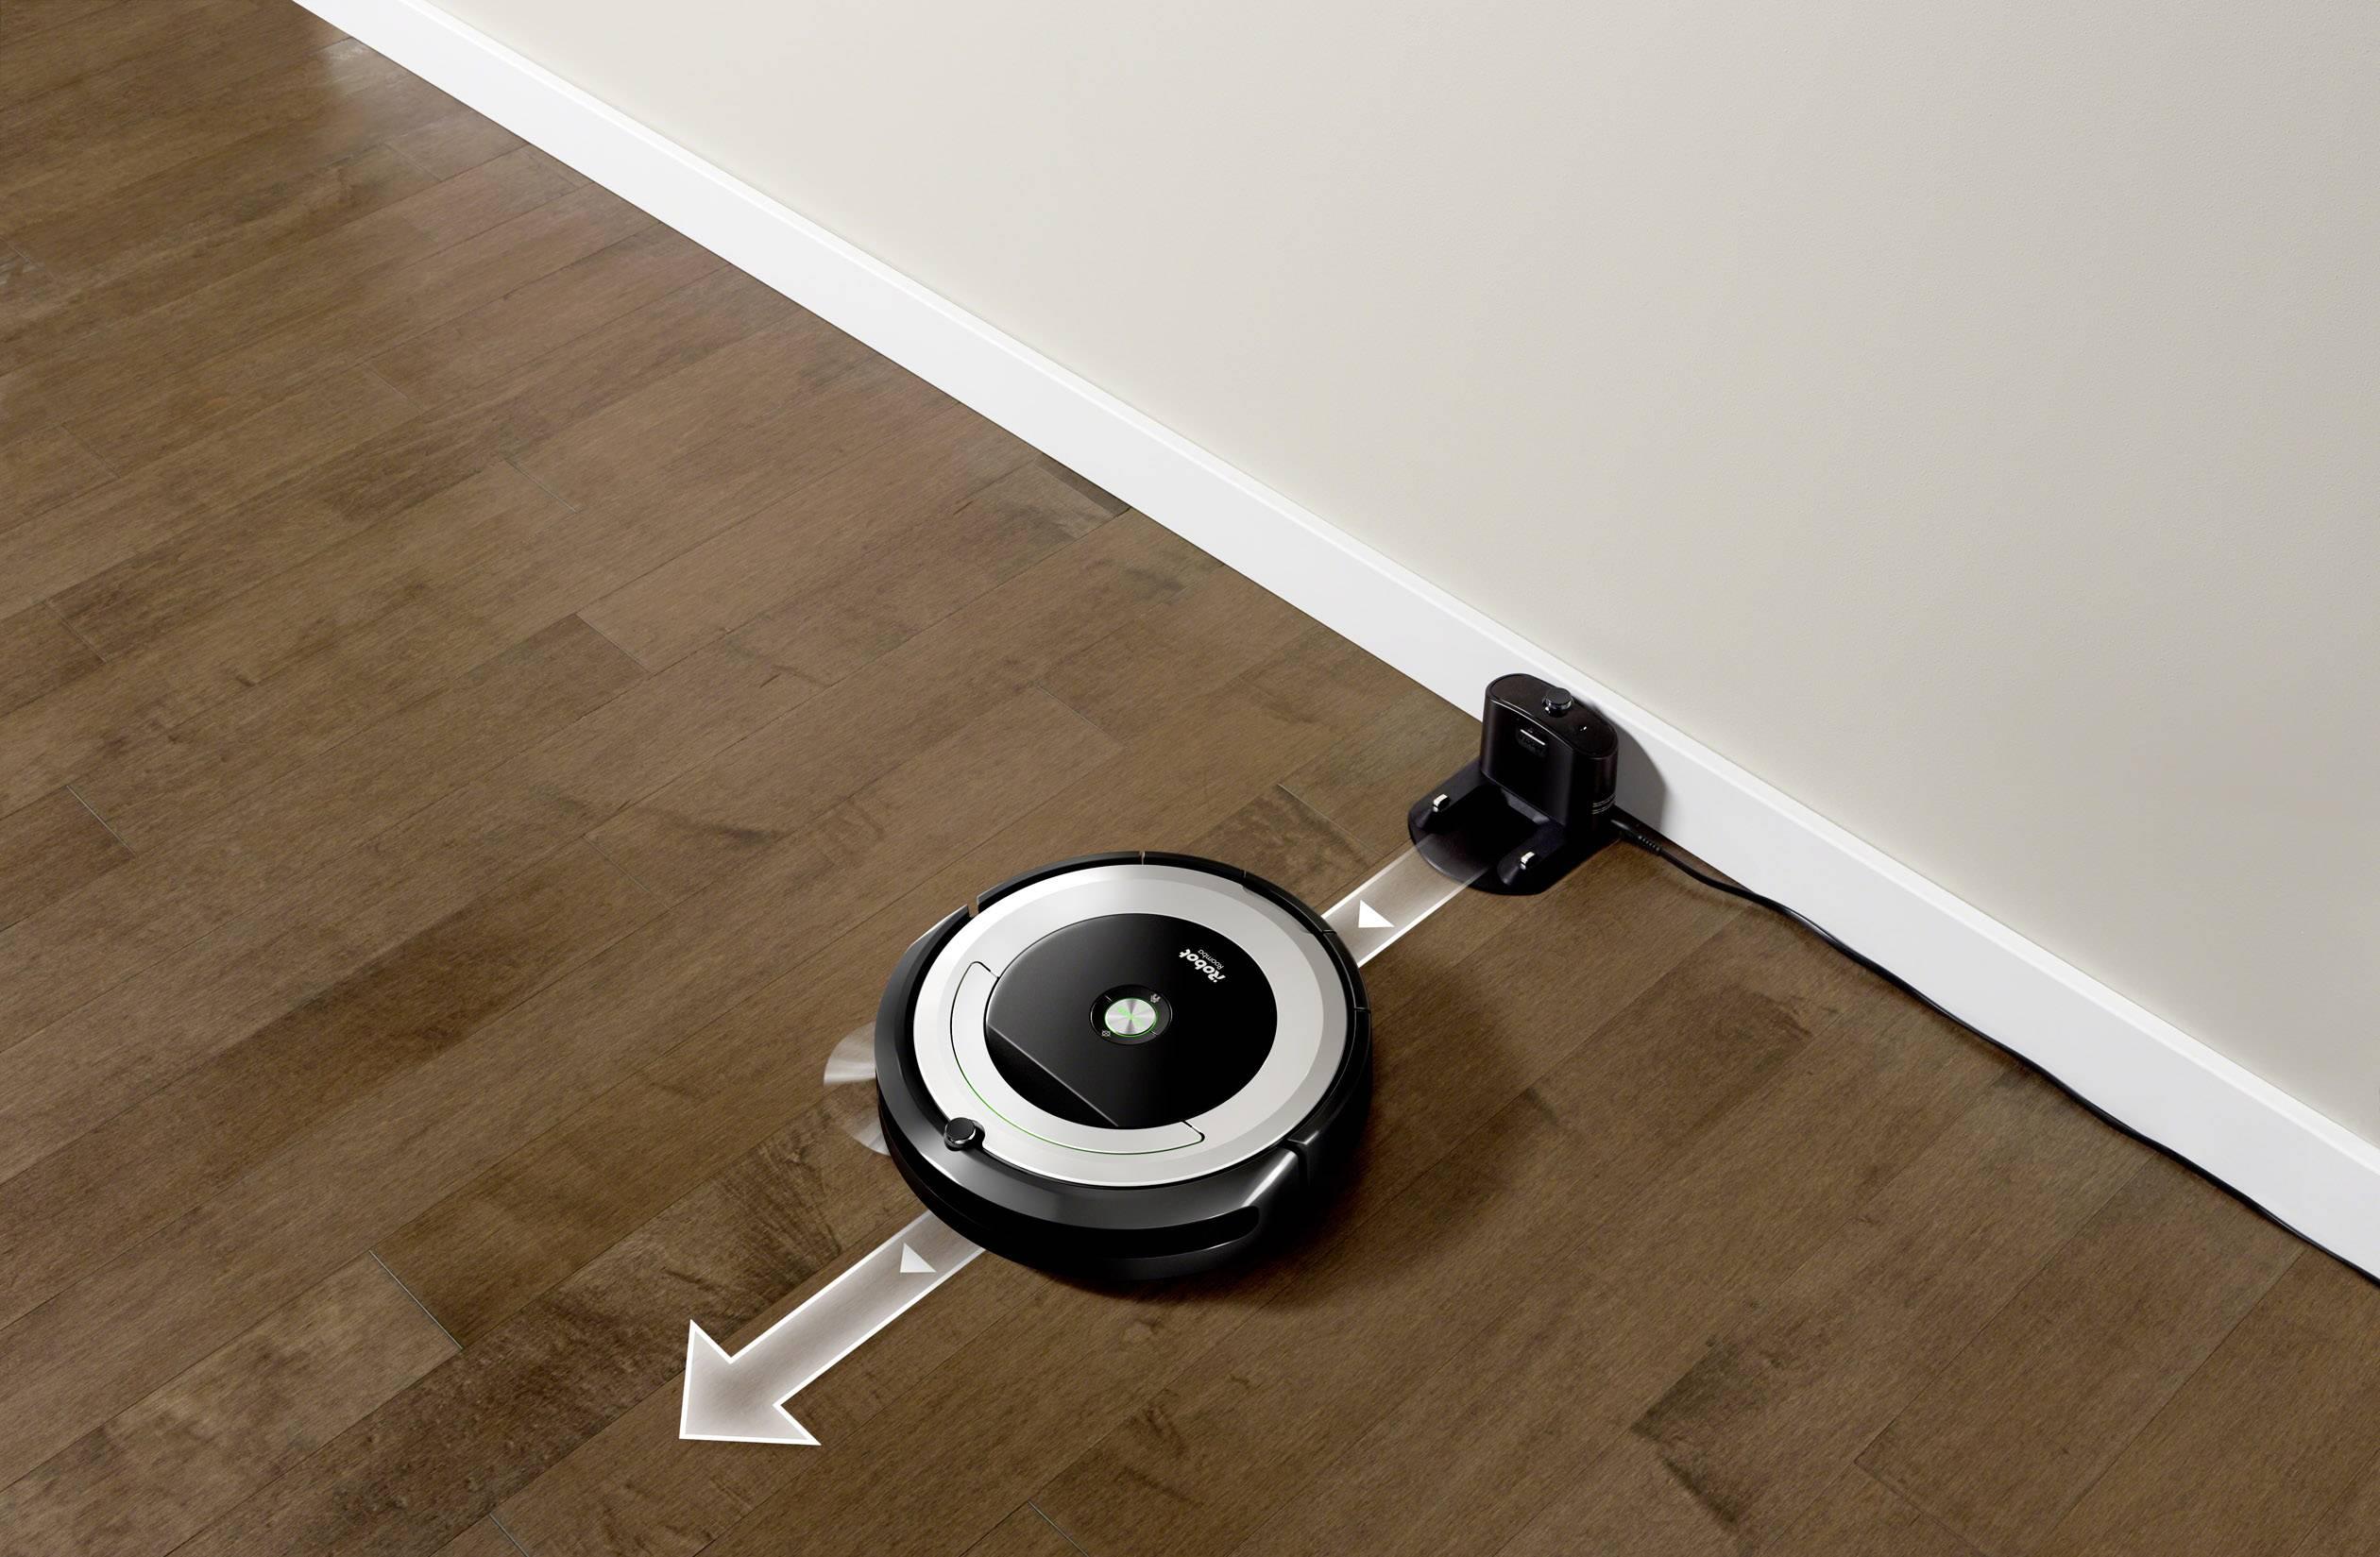 Irobot Roomba 691 Robot Aspirapolvere Nero Argento 1 Parete Virtuale